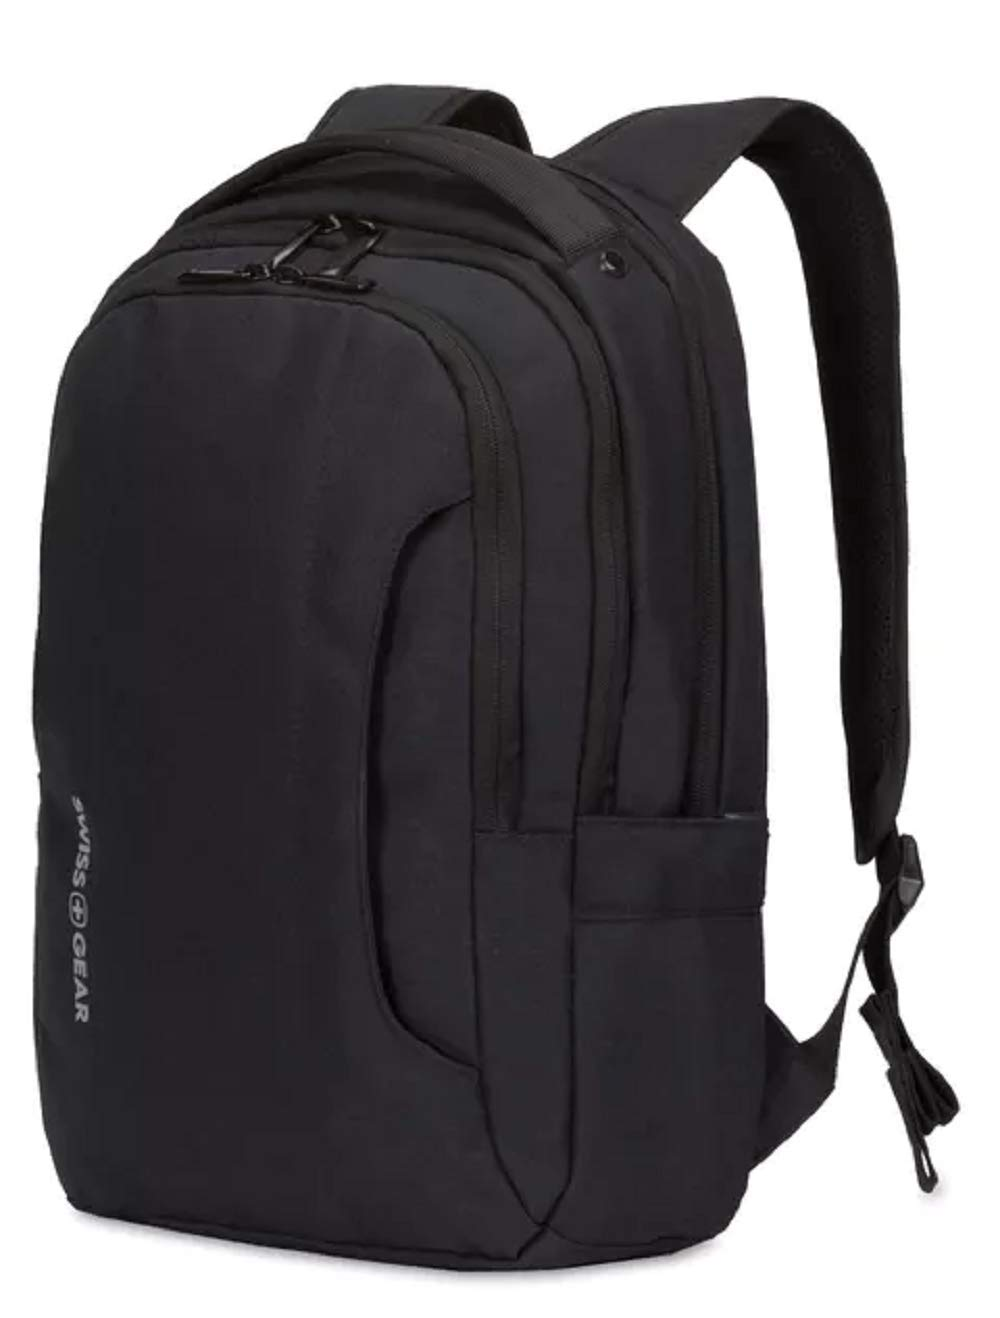 SWISSGEAR 3573 LAPTOP BACKPACK for School, Work, and Travel- BLACK/WHITE LOGO by Swiss Gear